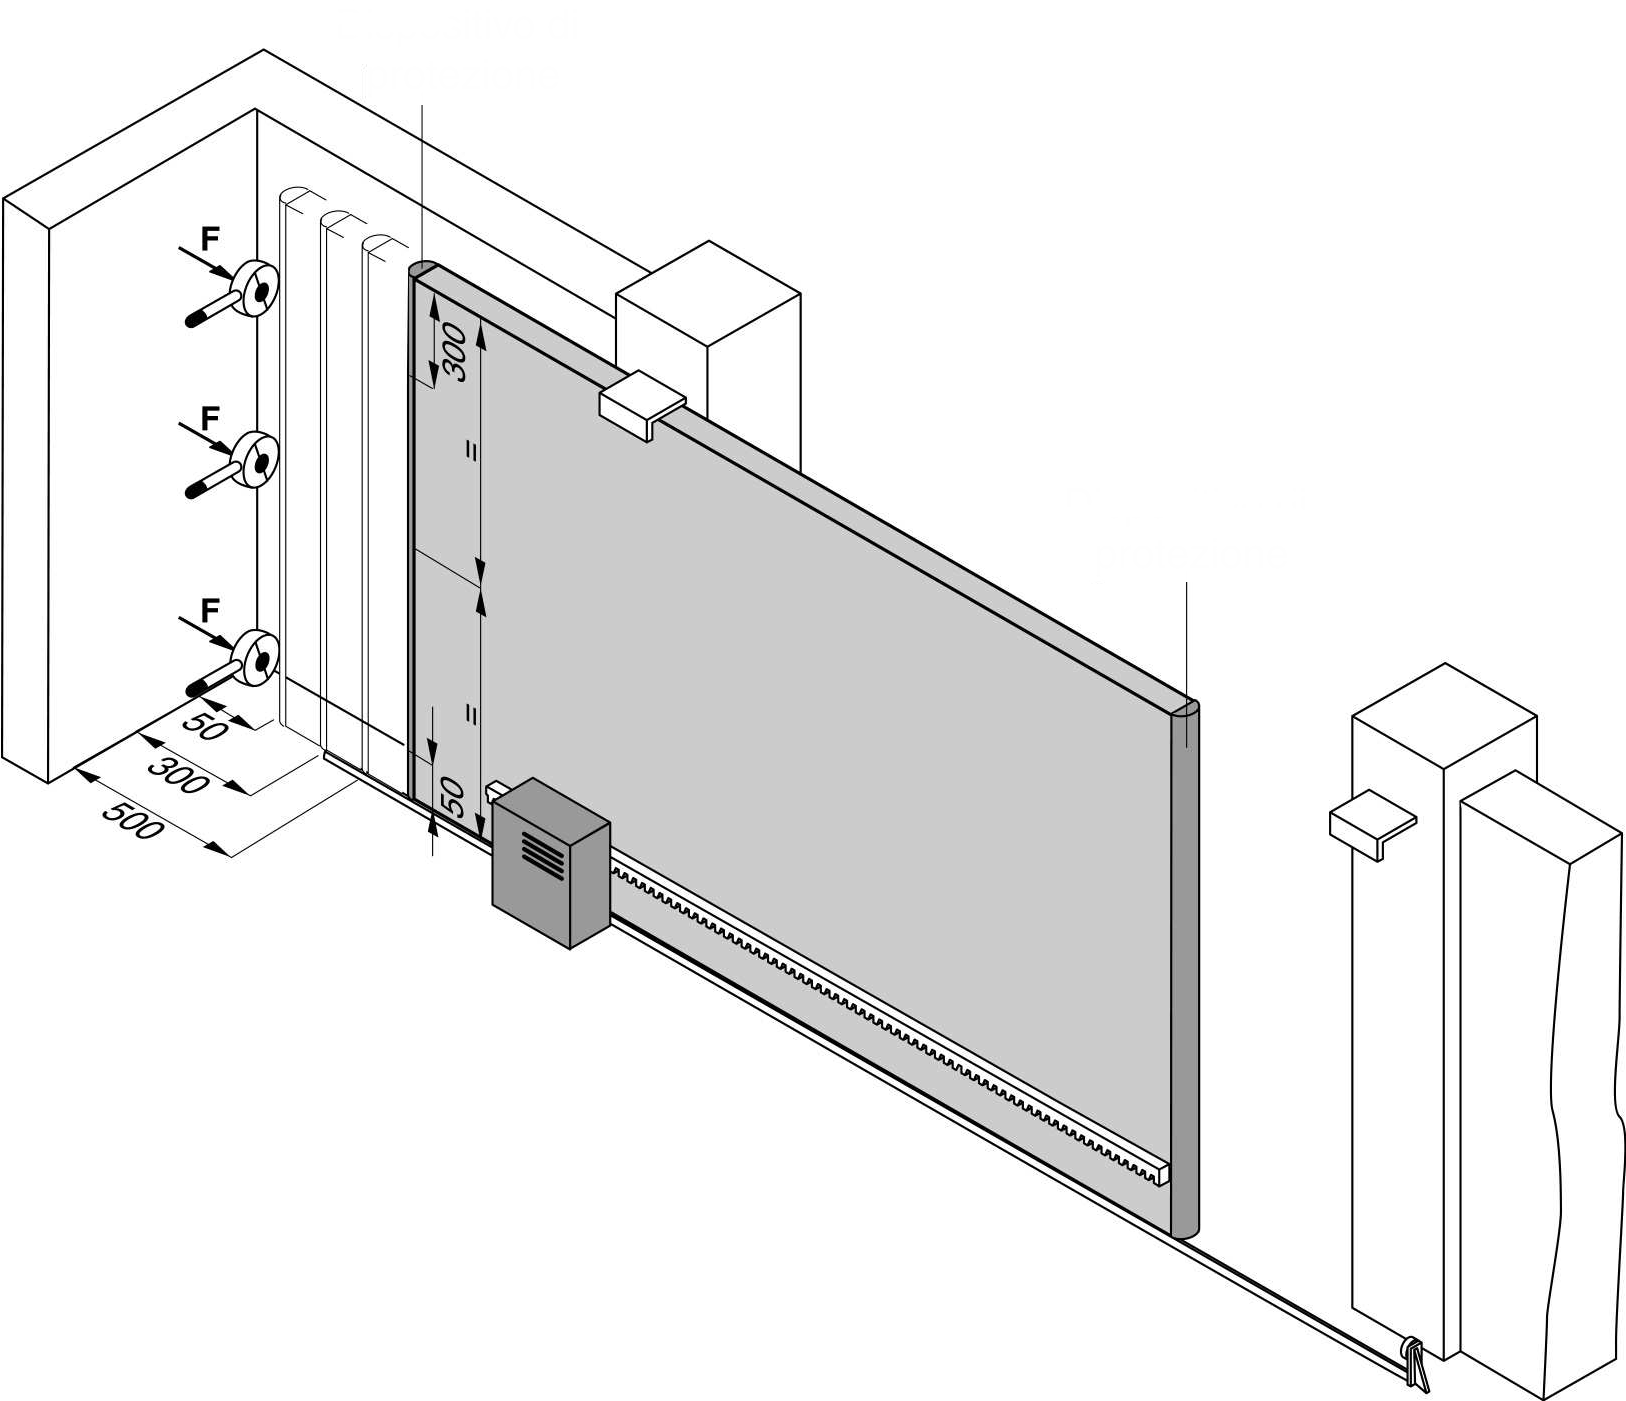 sliding gate plans free. Test points on a sliding gate Gate Safety Legislation